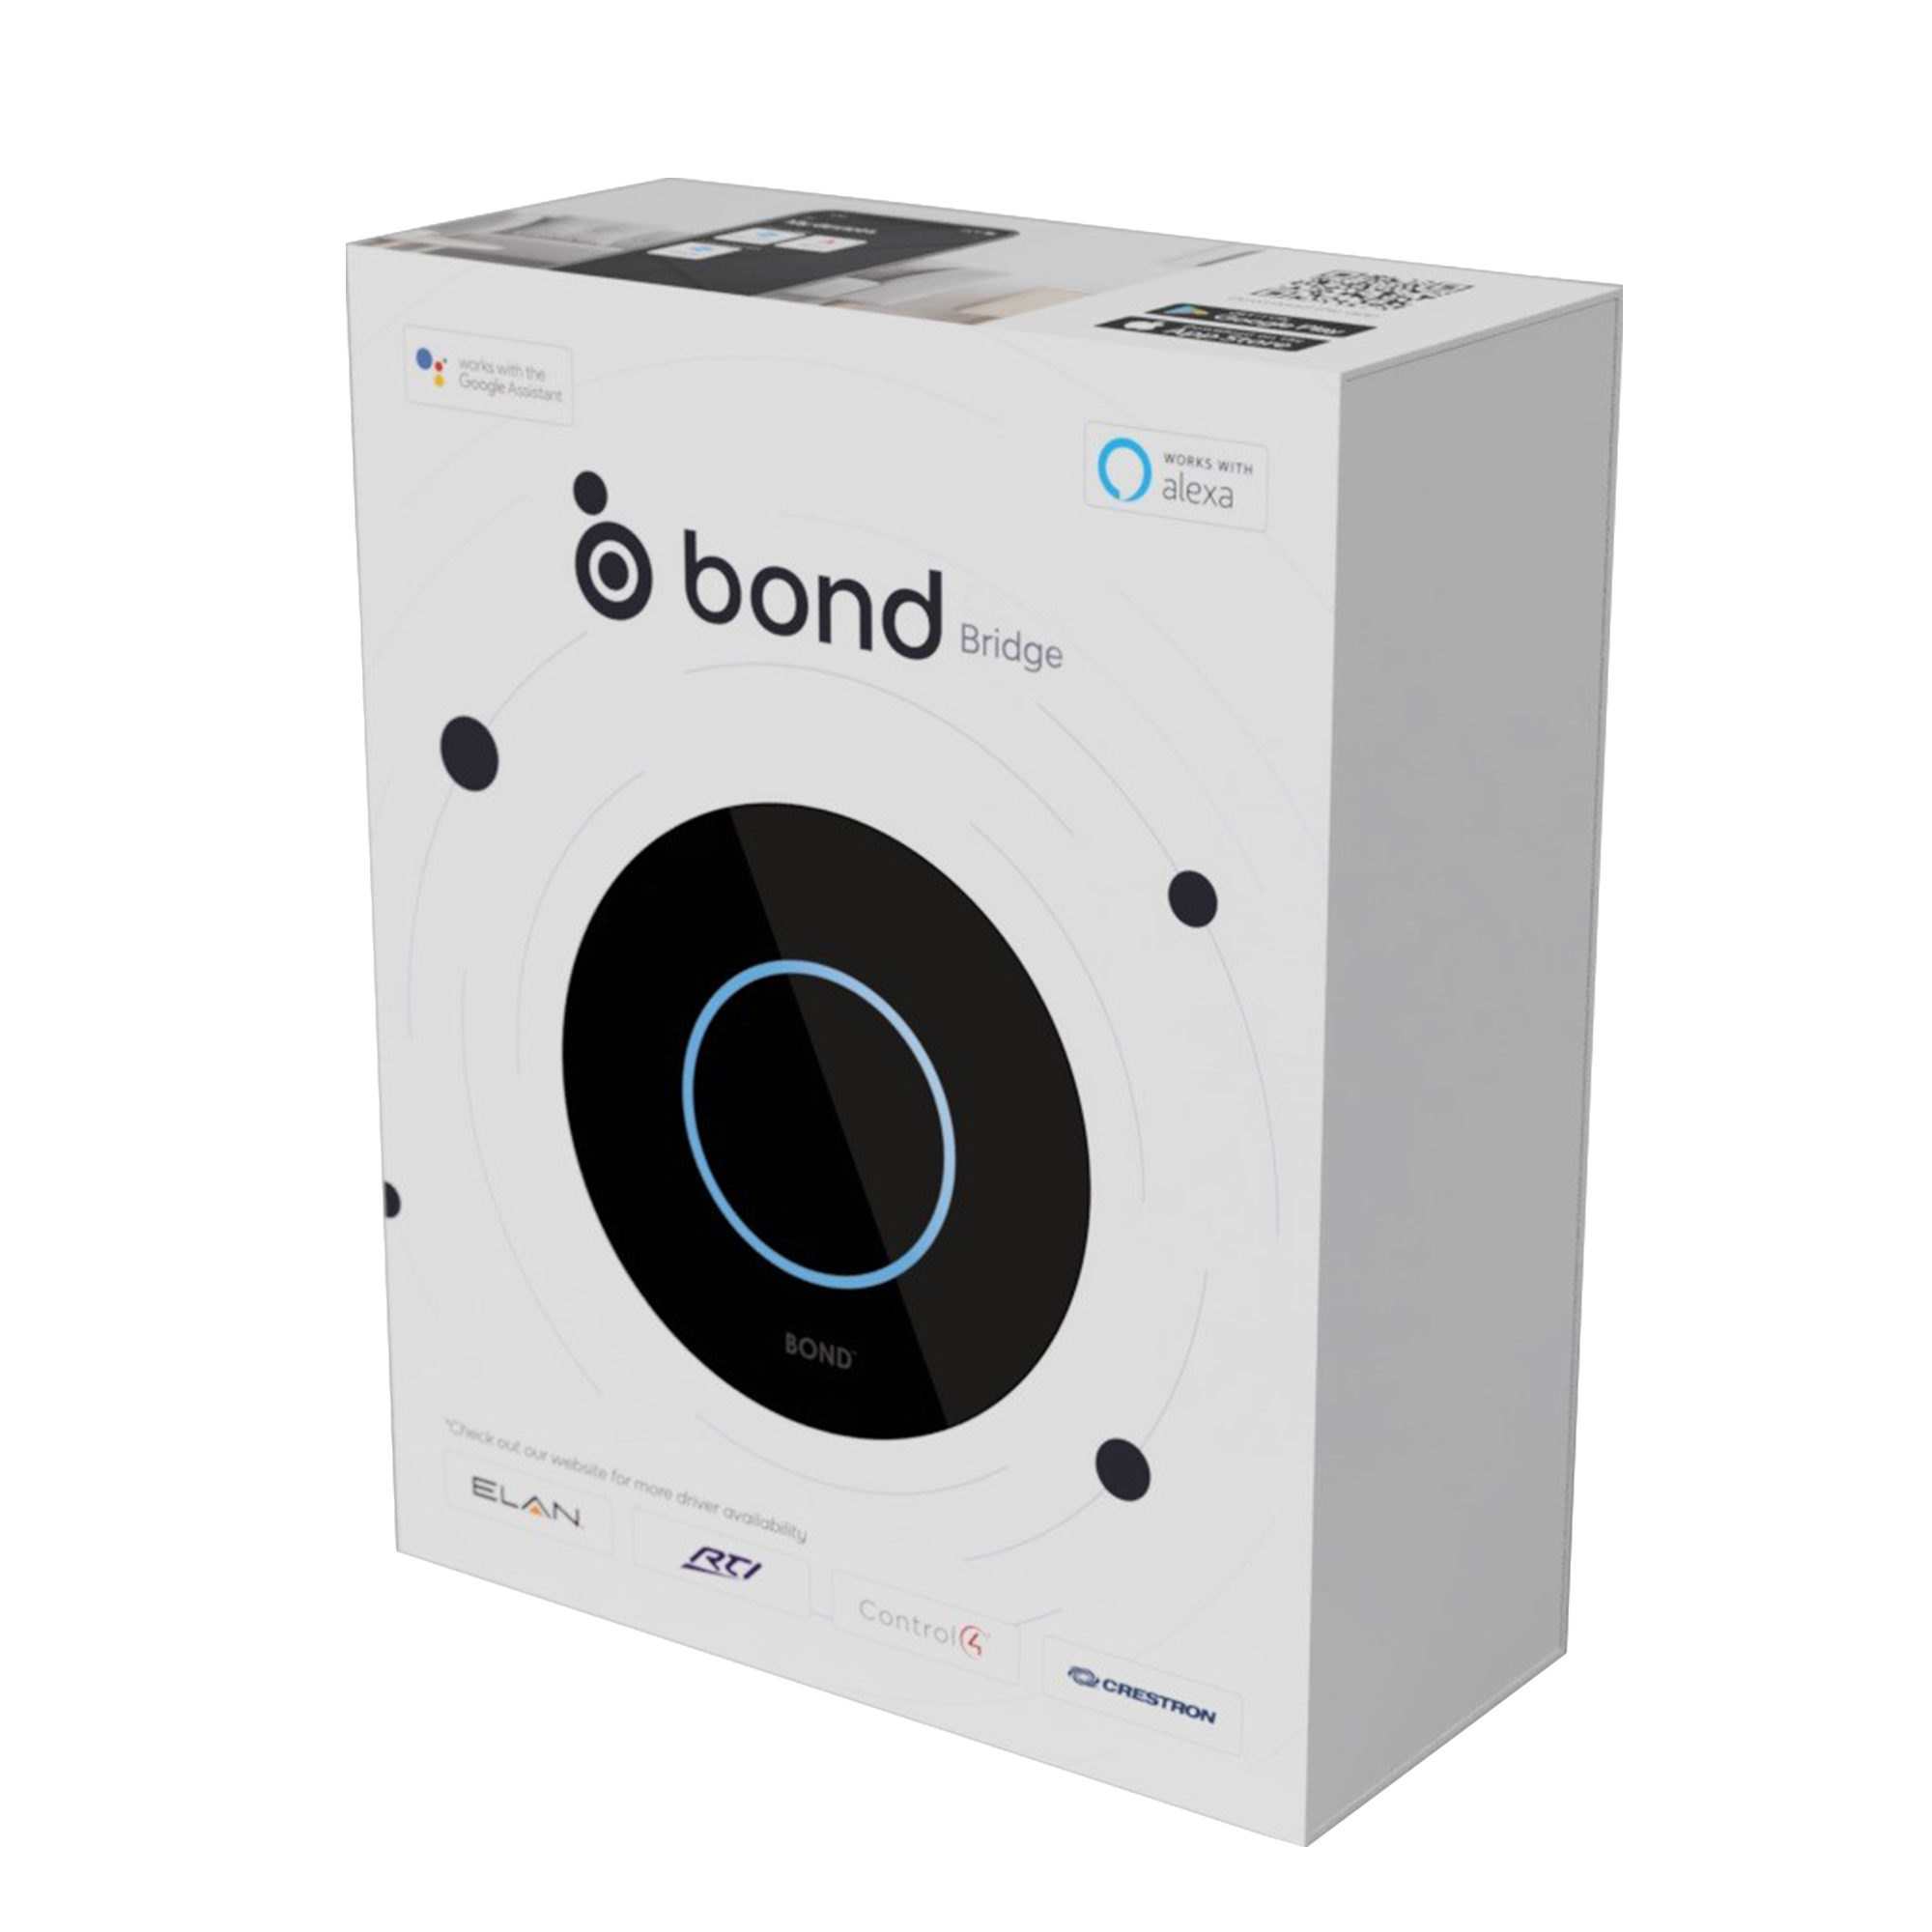 Bond Box Square